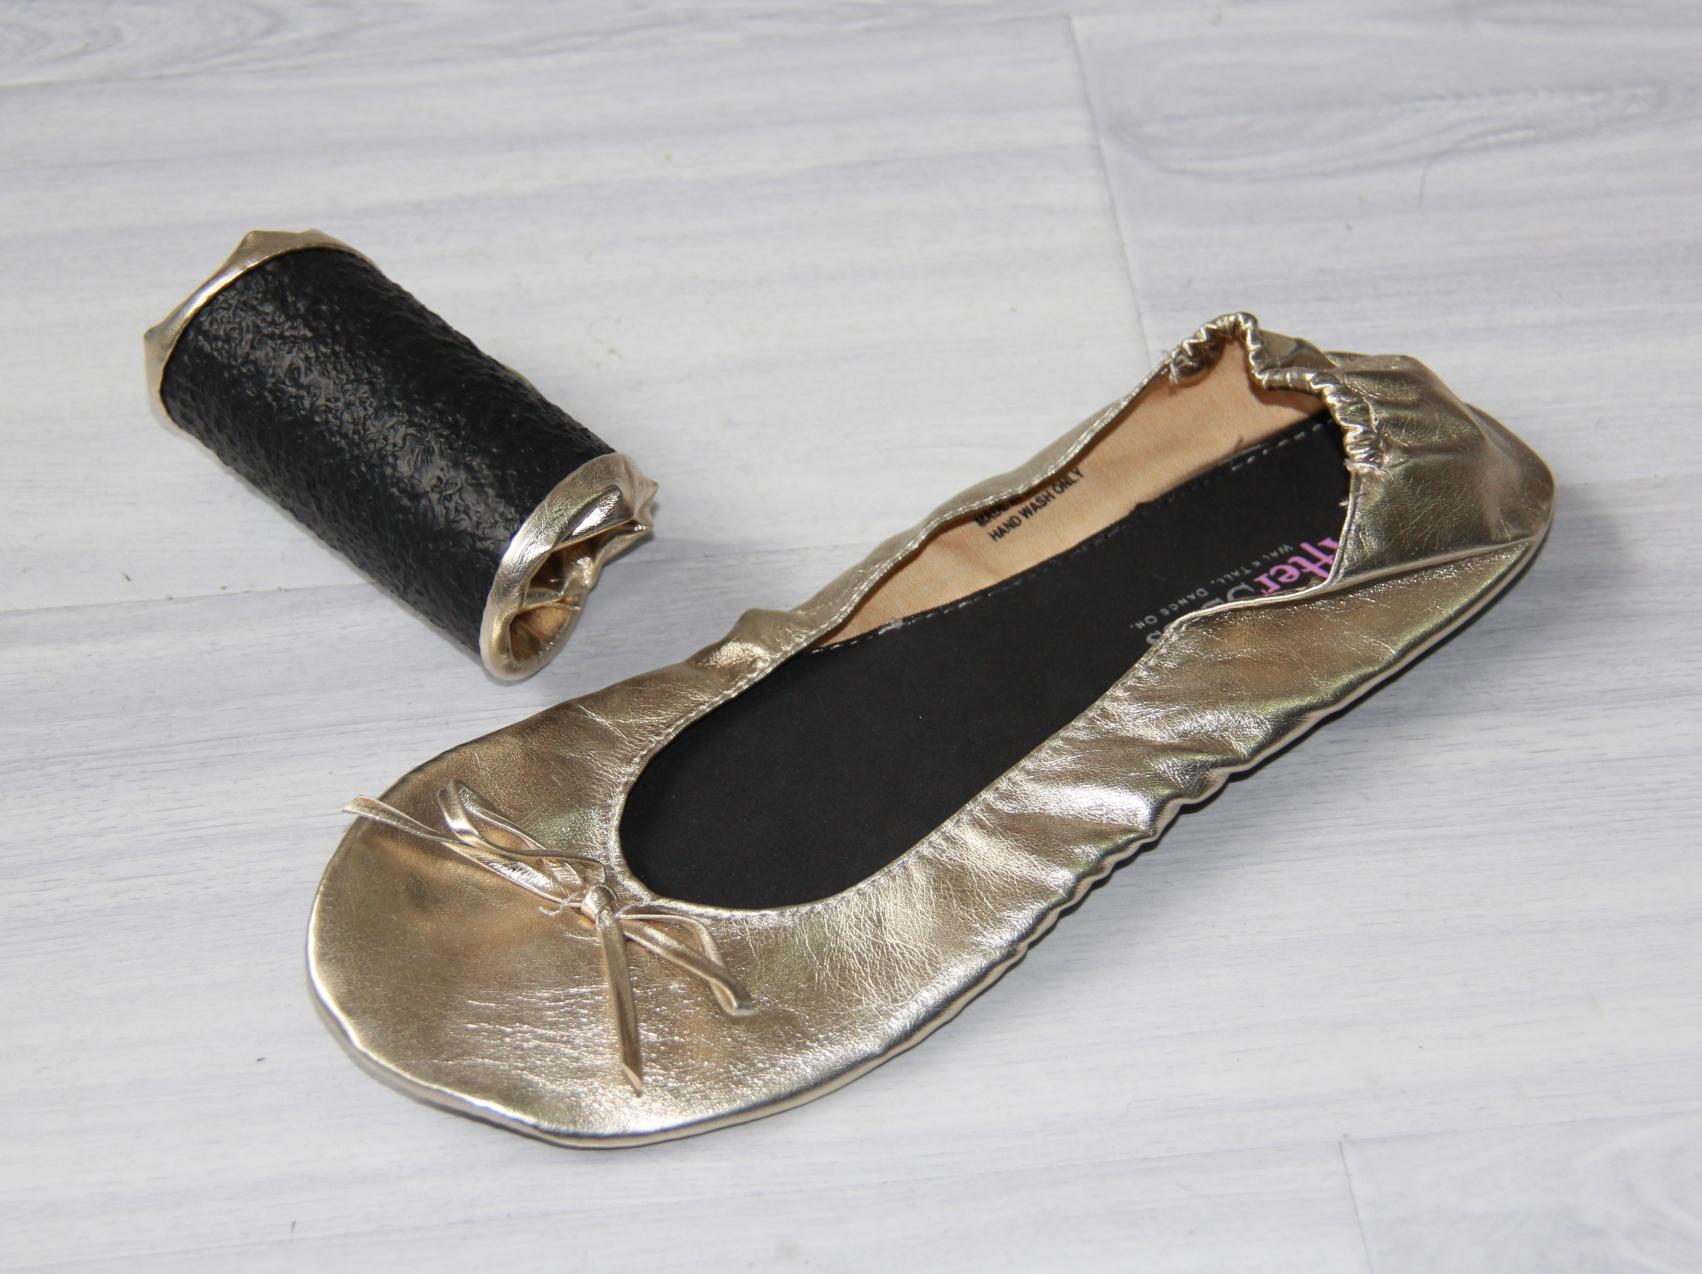 175f7da5c39 Footwear Products - Vlin Plastic-Interesting Foldable   Roll Up ...